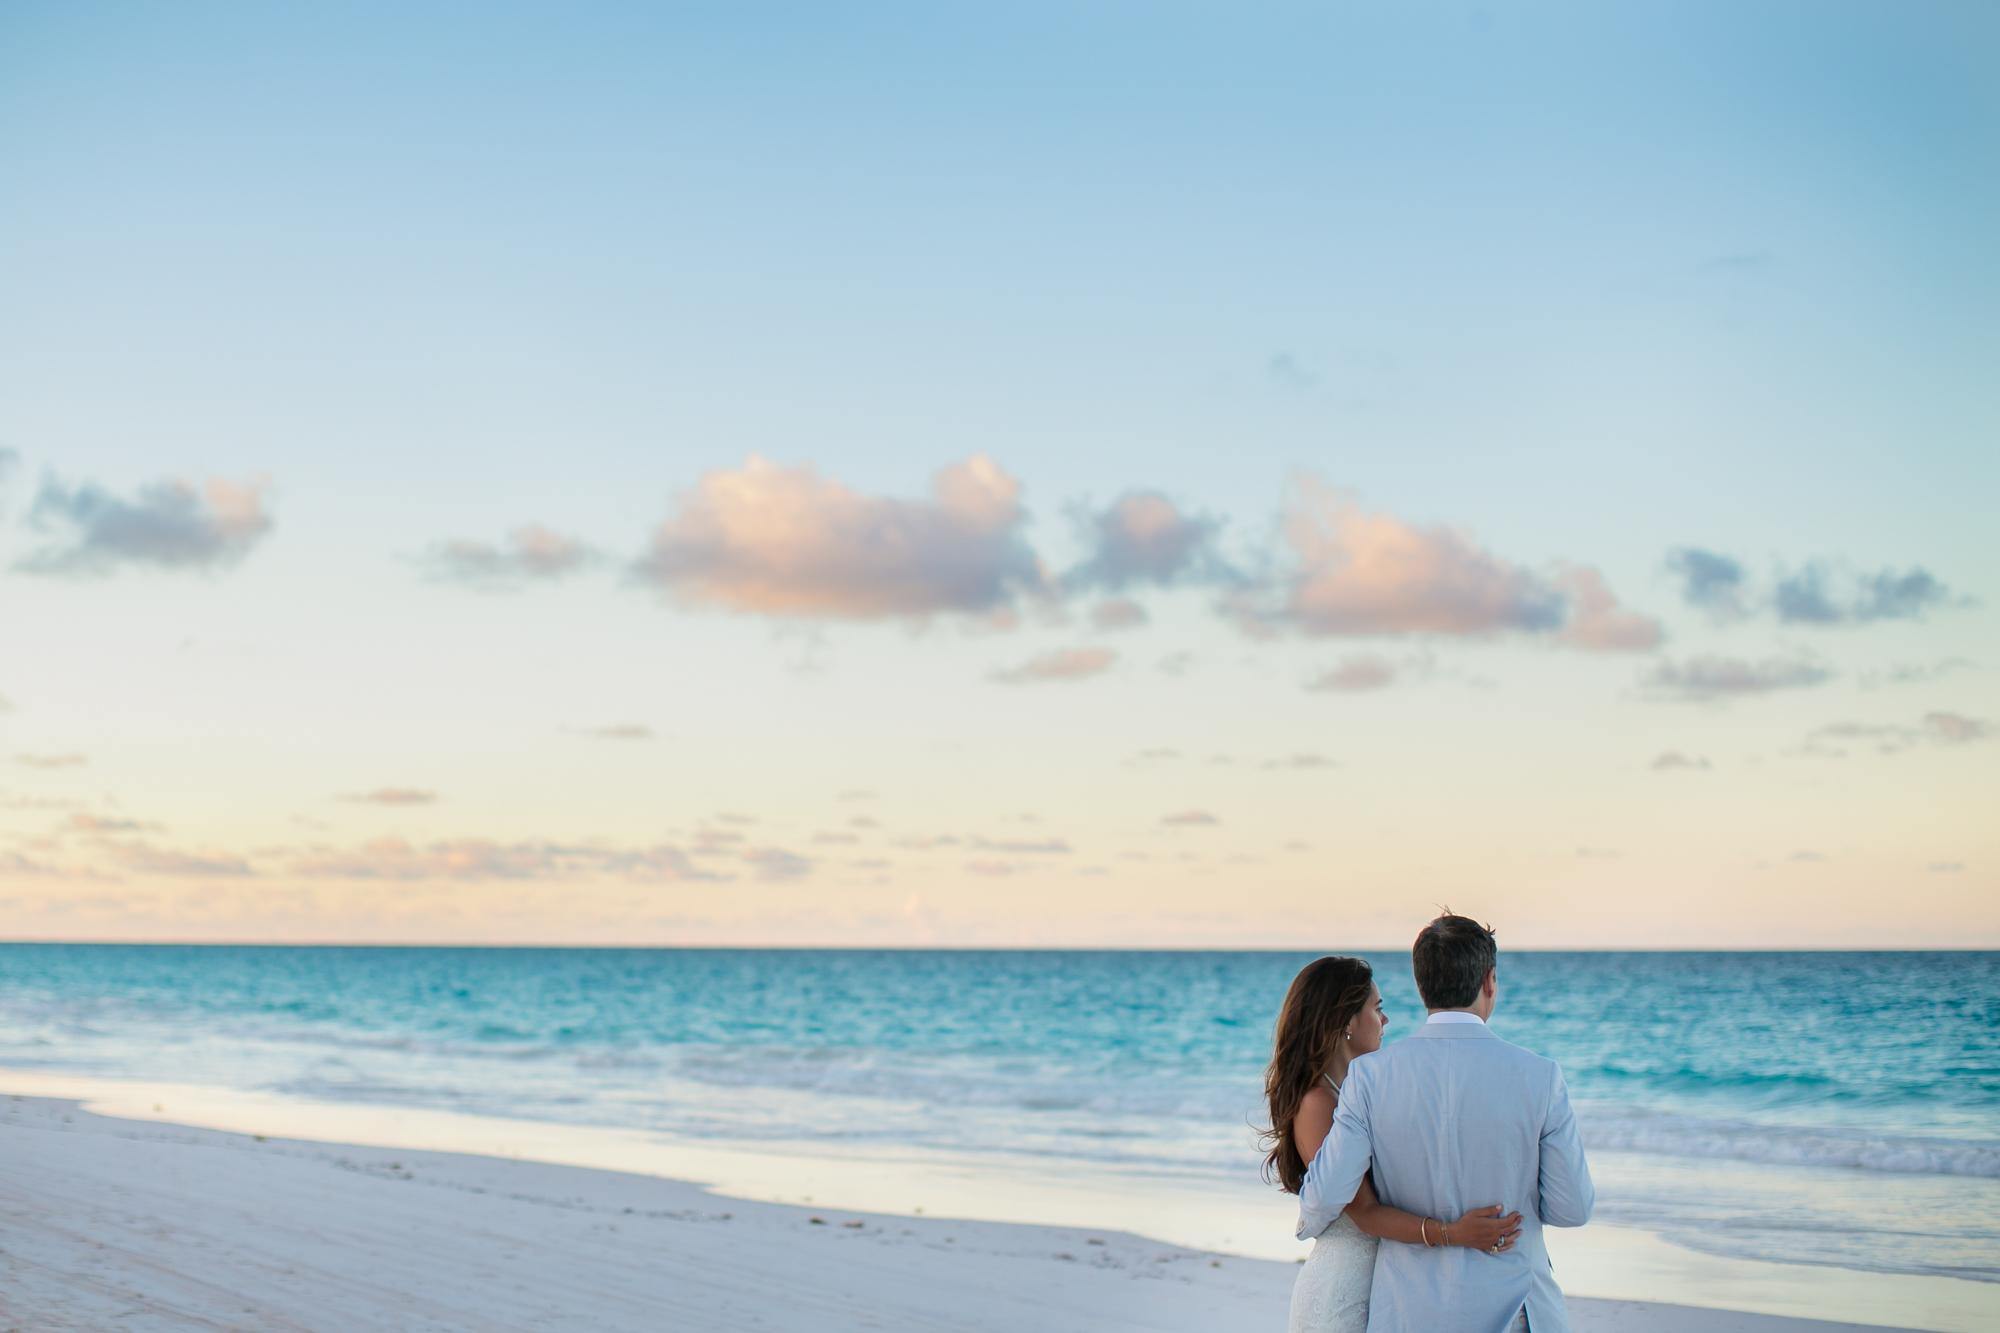 20150620_2015.06.20_Bahama Wedding_website_UD9A9755 copy.jpg